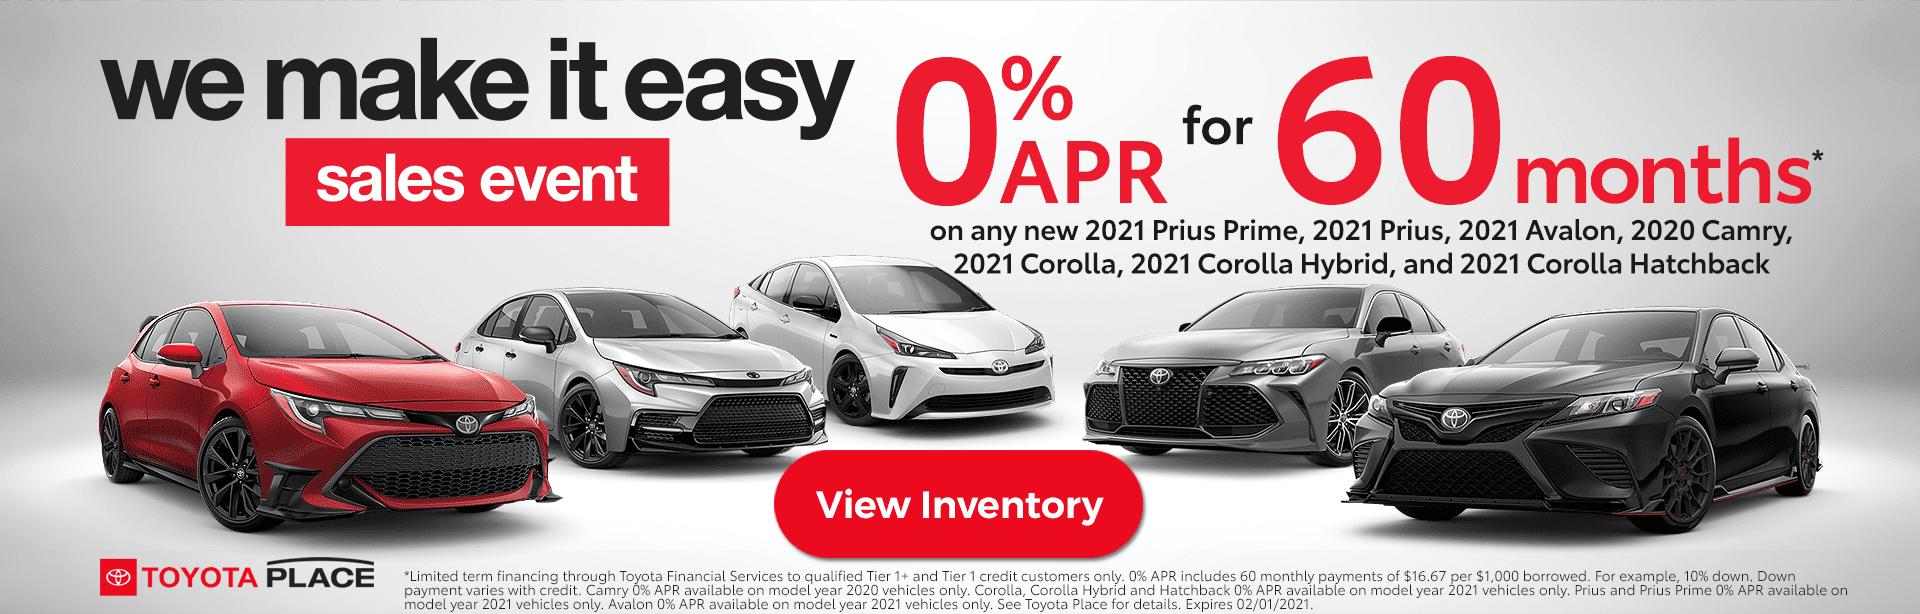 We Make it Easy Toyota Sales Event Orange County - Zero Percent APR